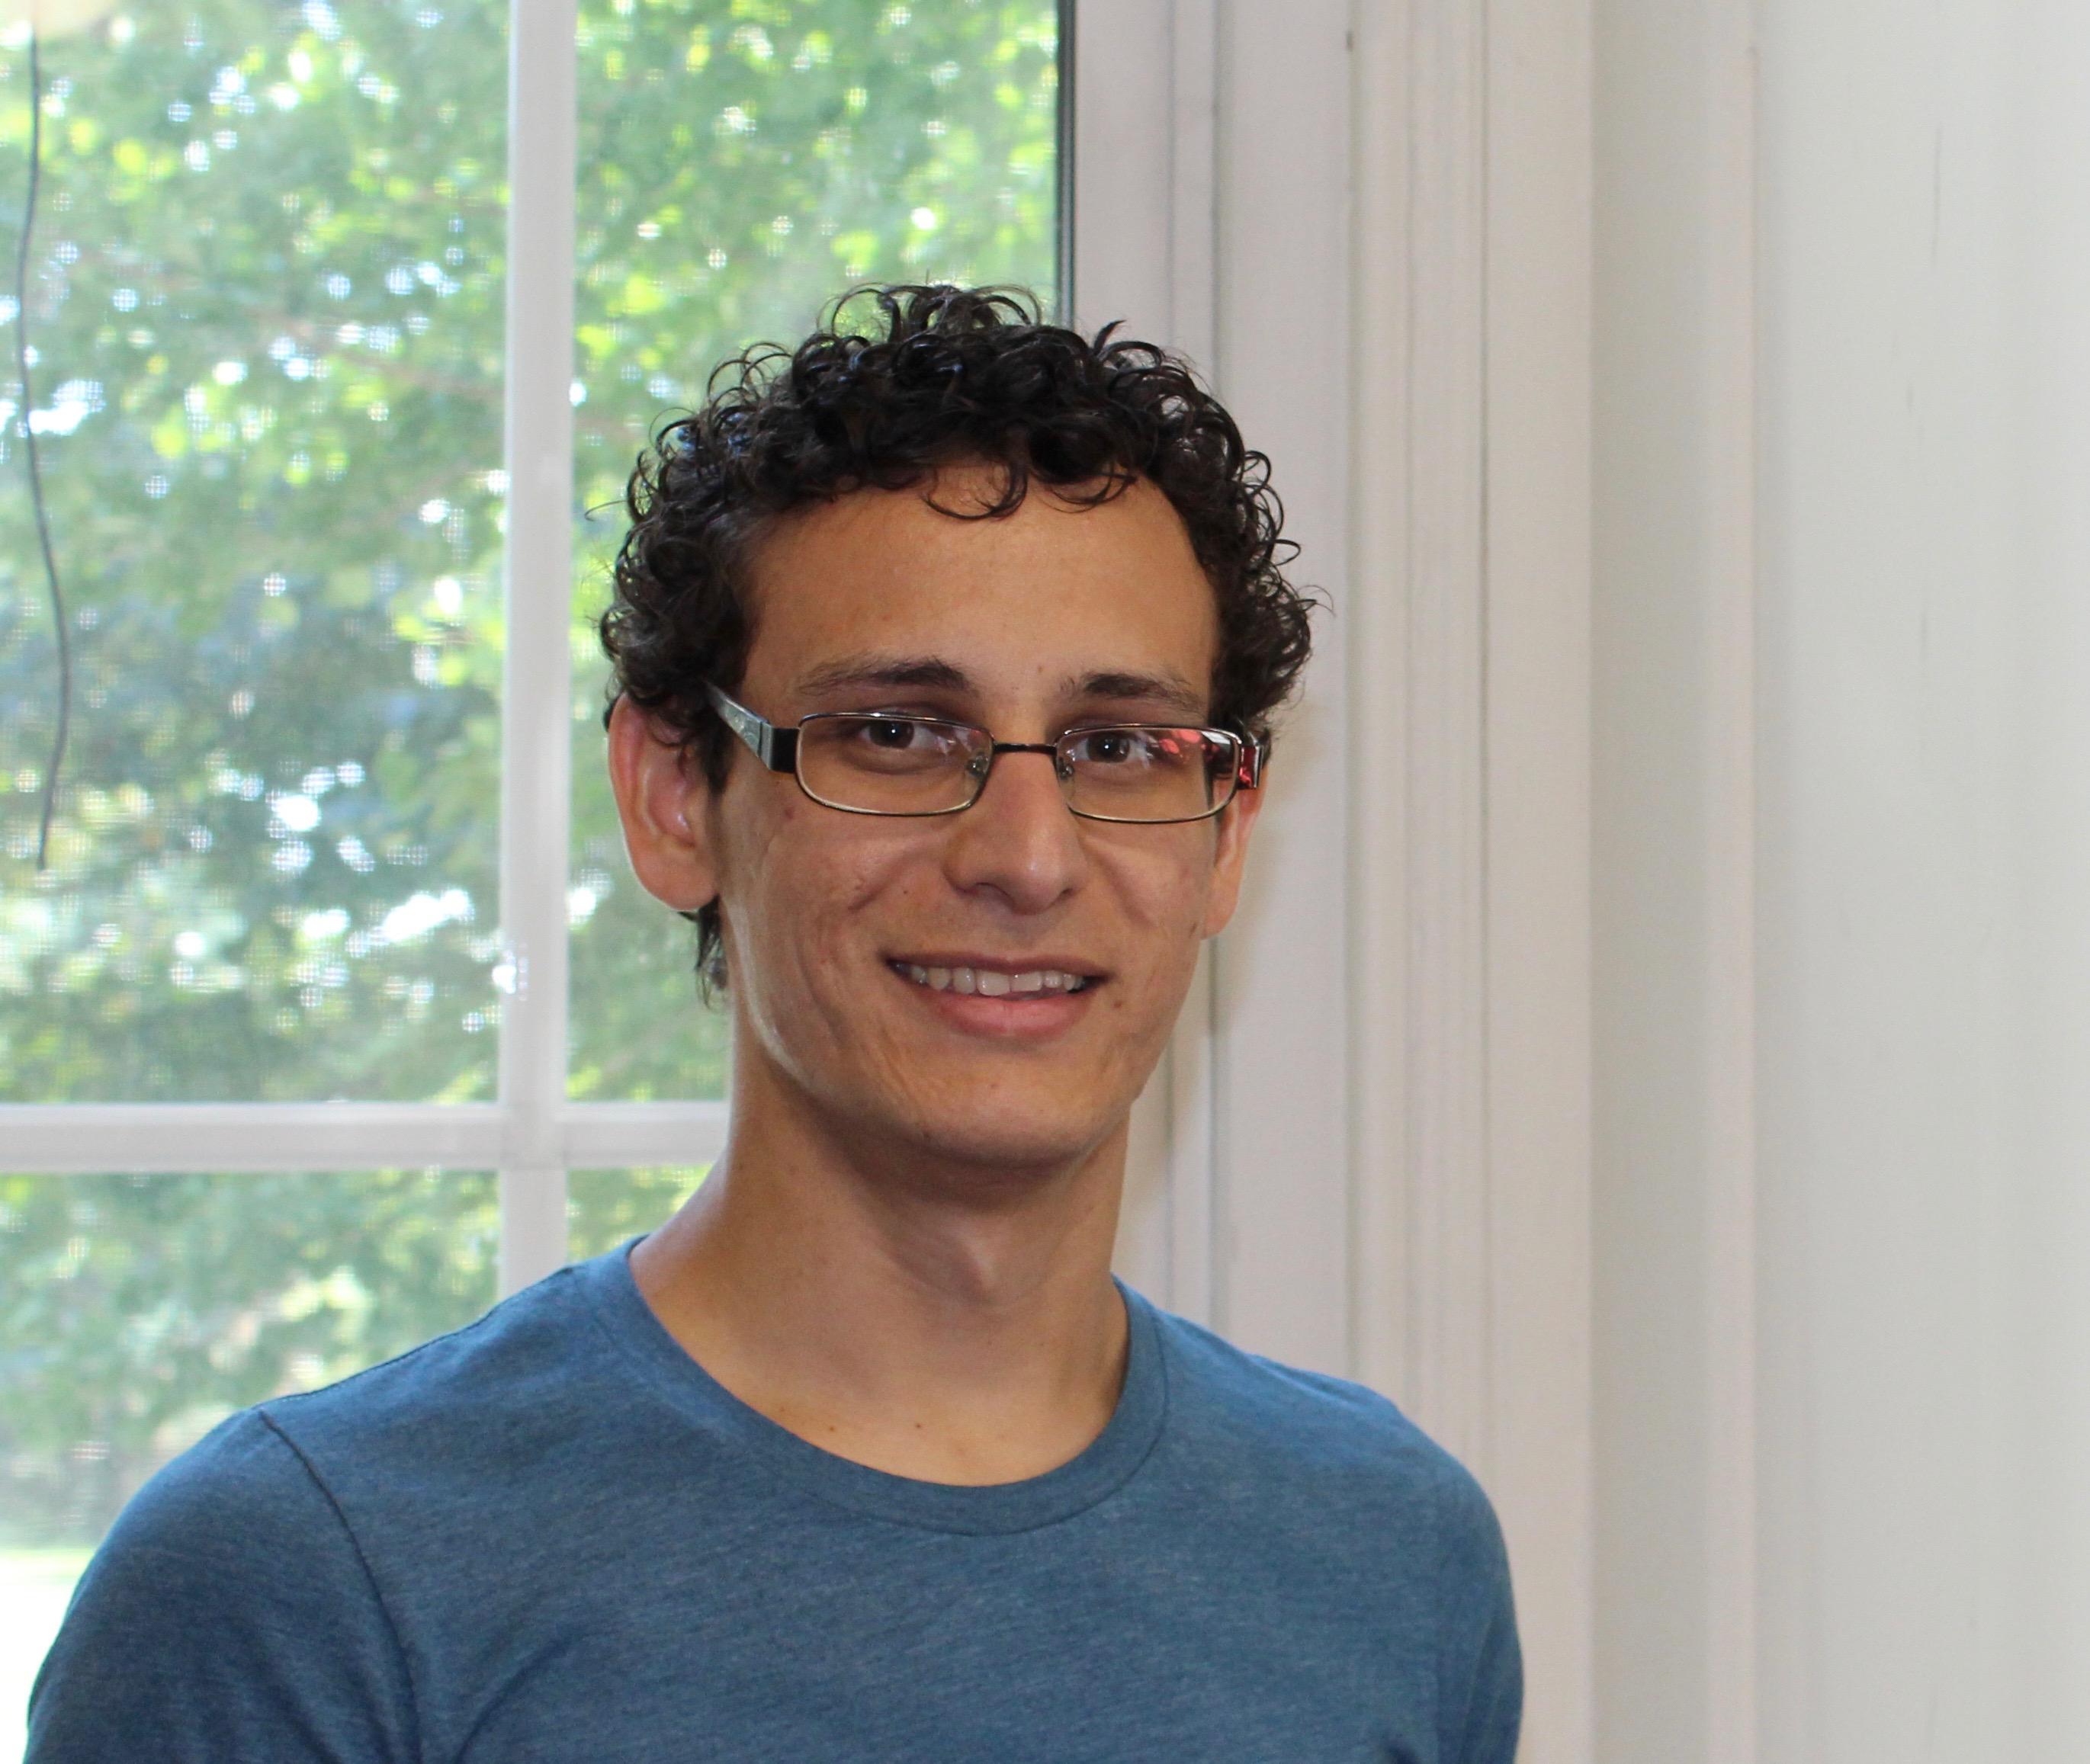 Valentin Sanchez '21